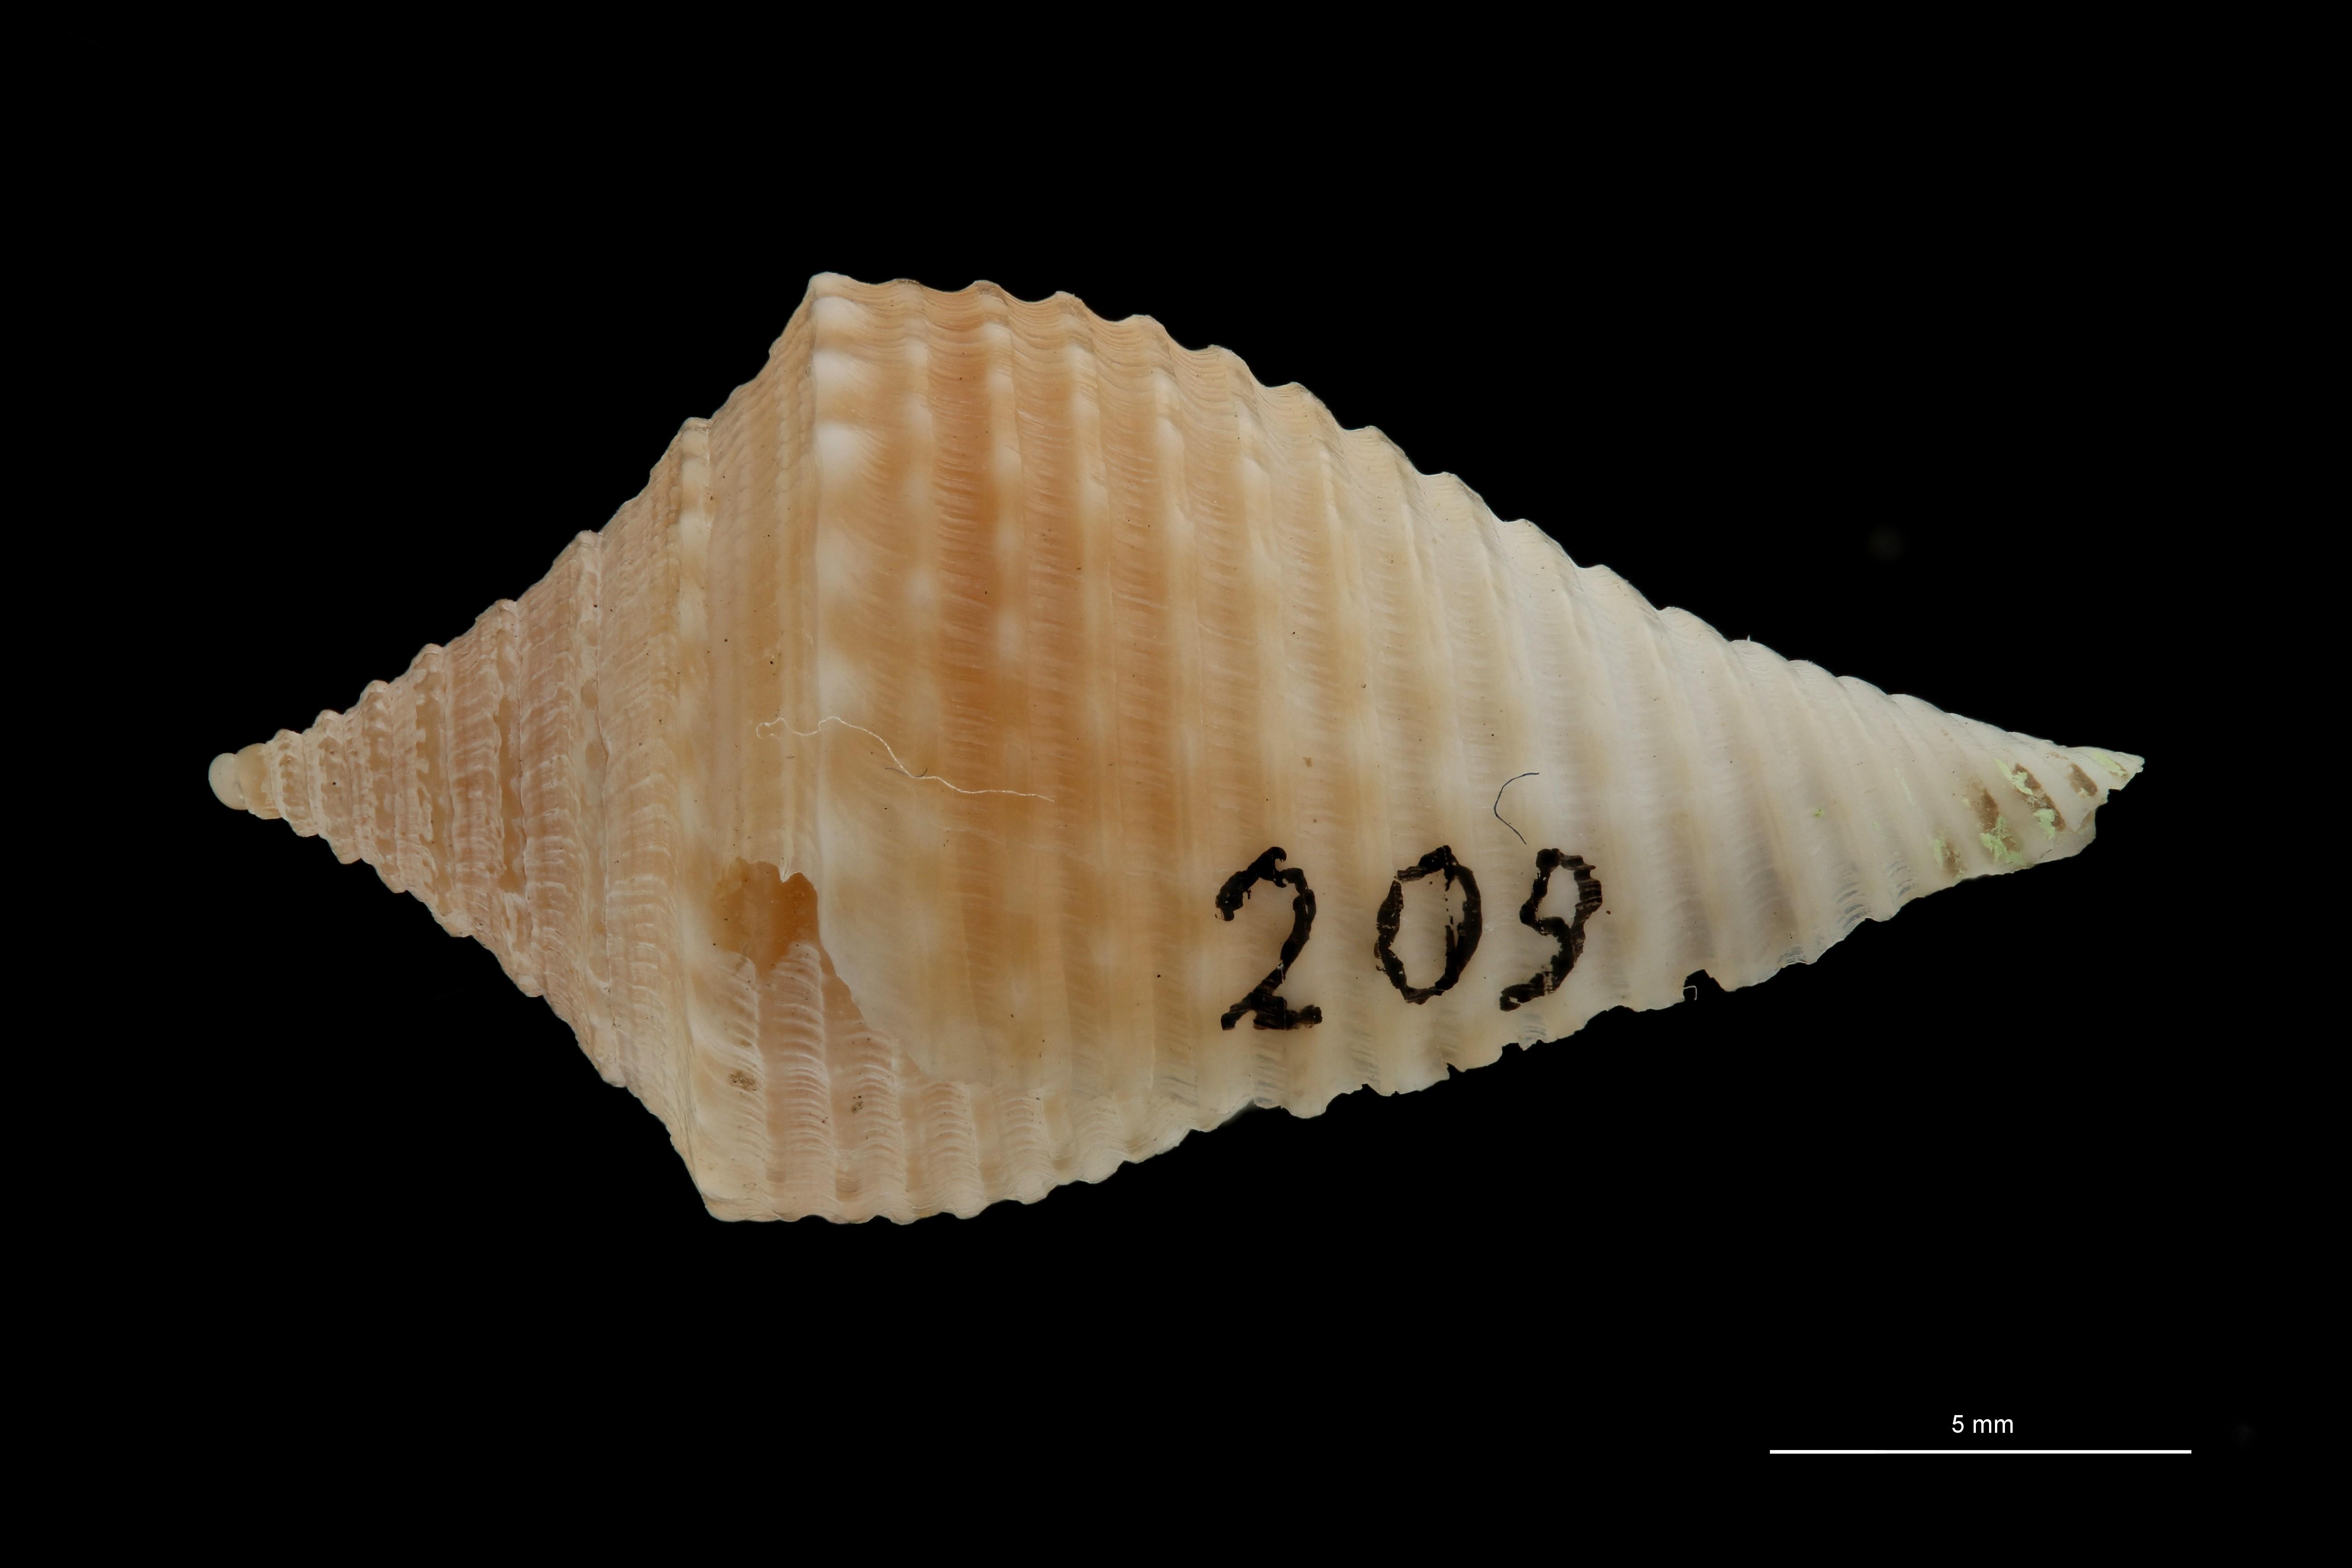 BE-RBINS-INV MT.3033 Conus guyanensis Pt L ZS PMax Scaled.jpg